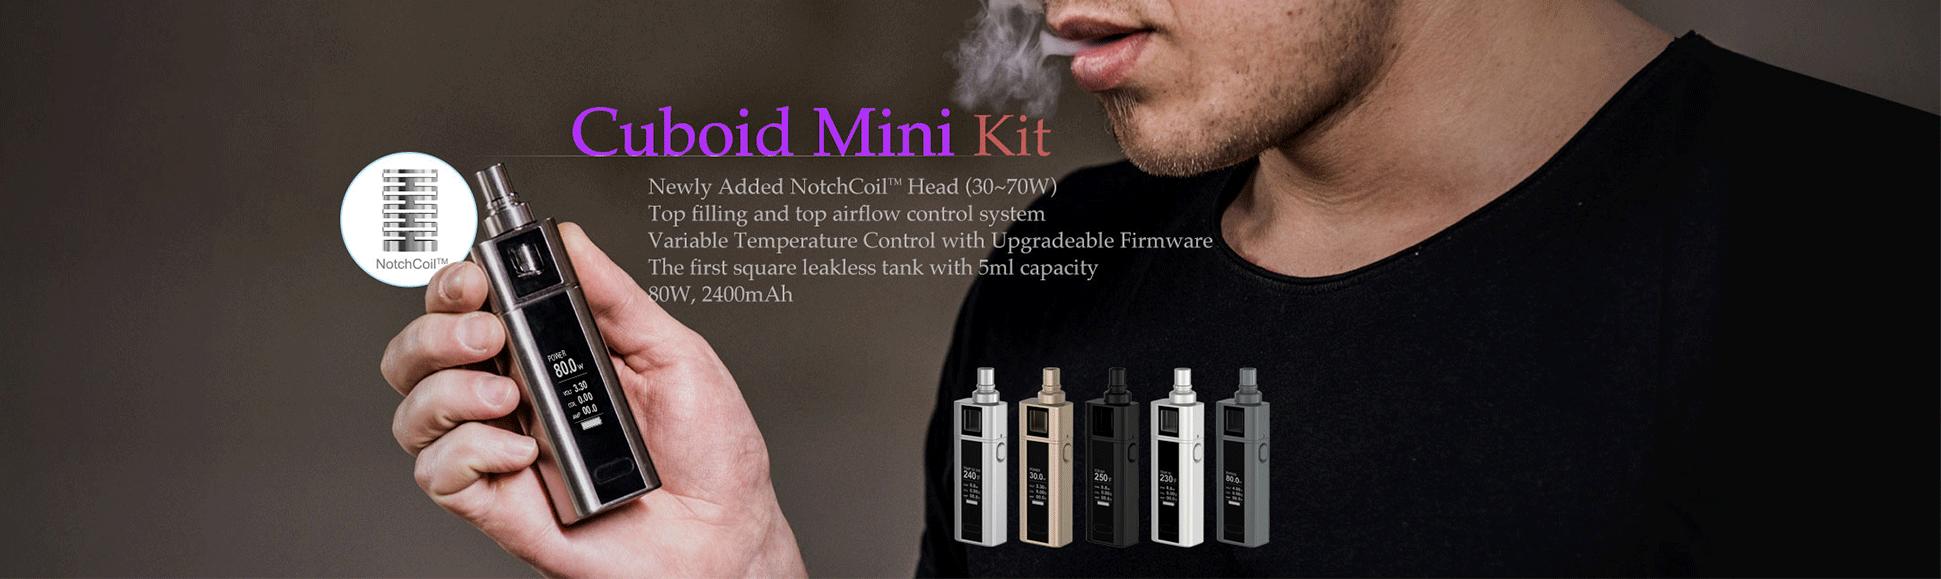 Cuboid-Mini-Kit